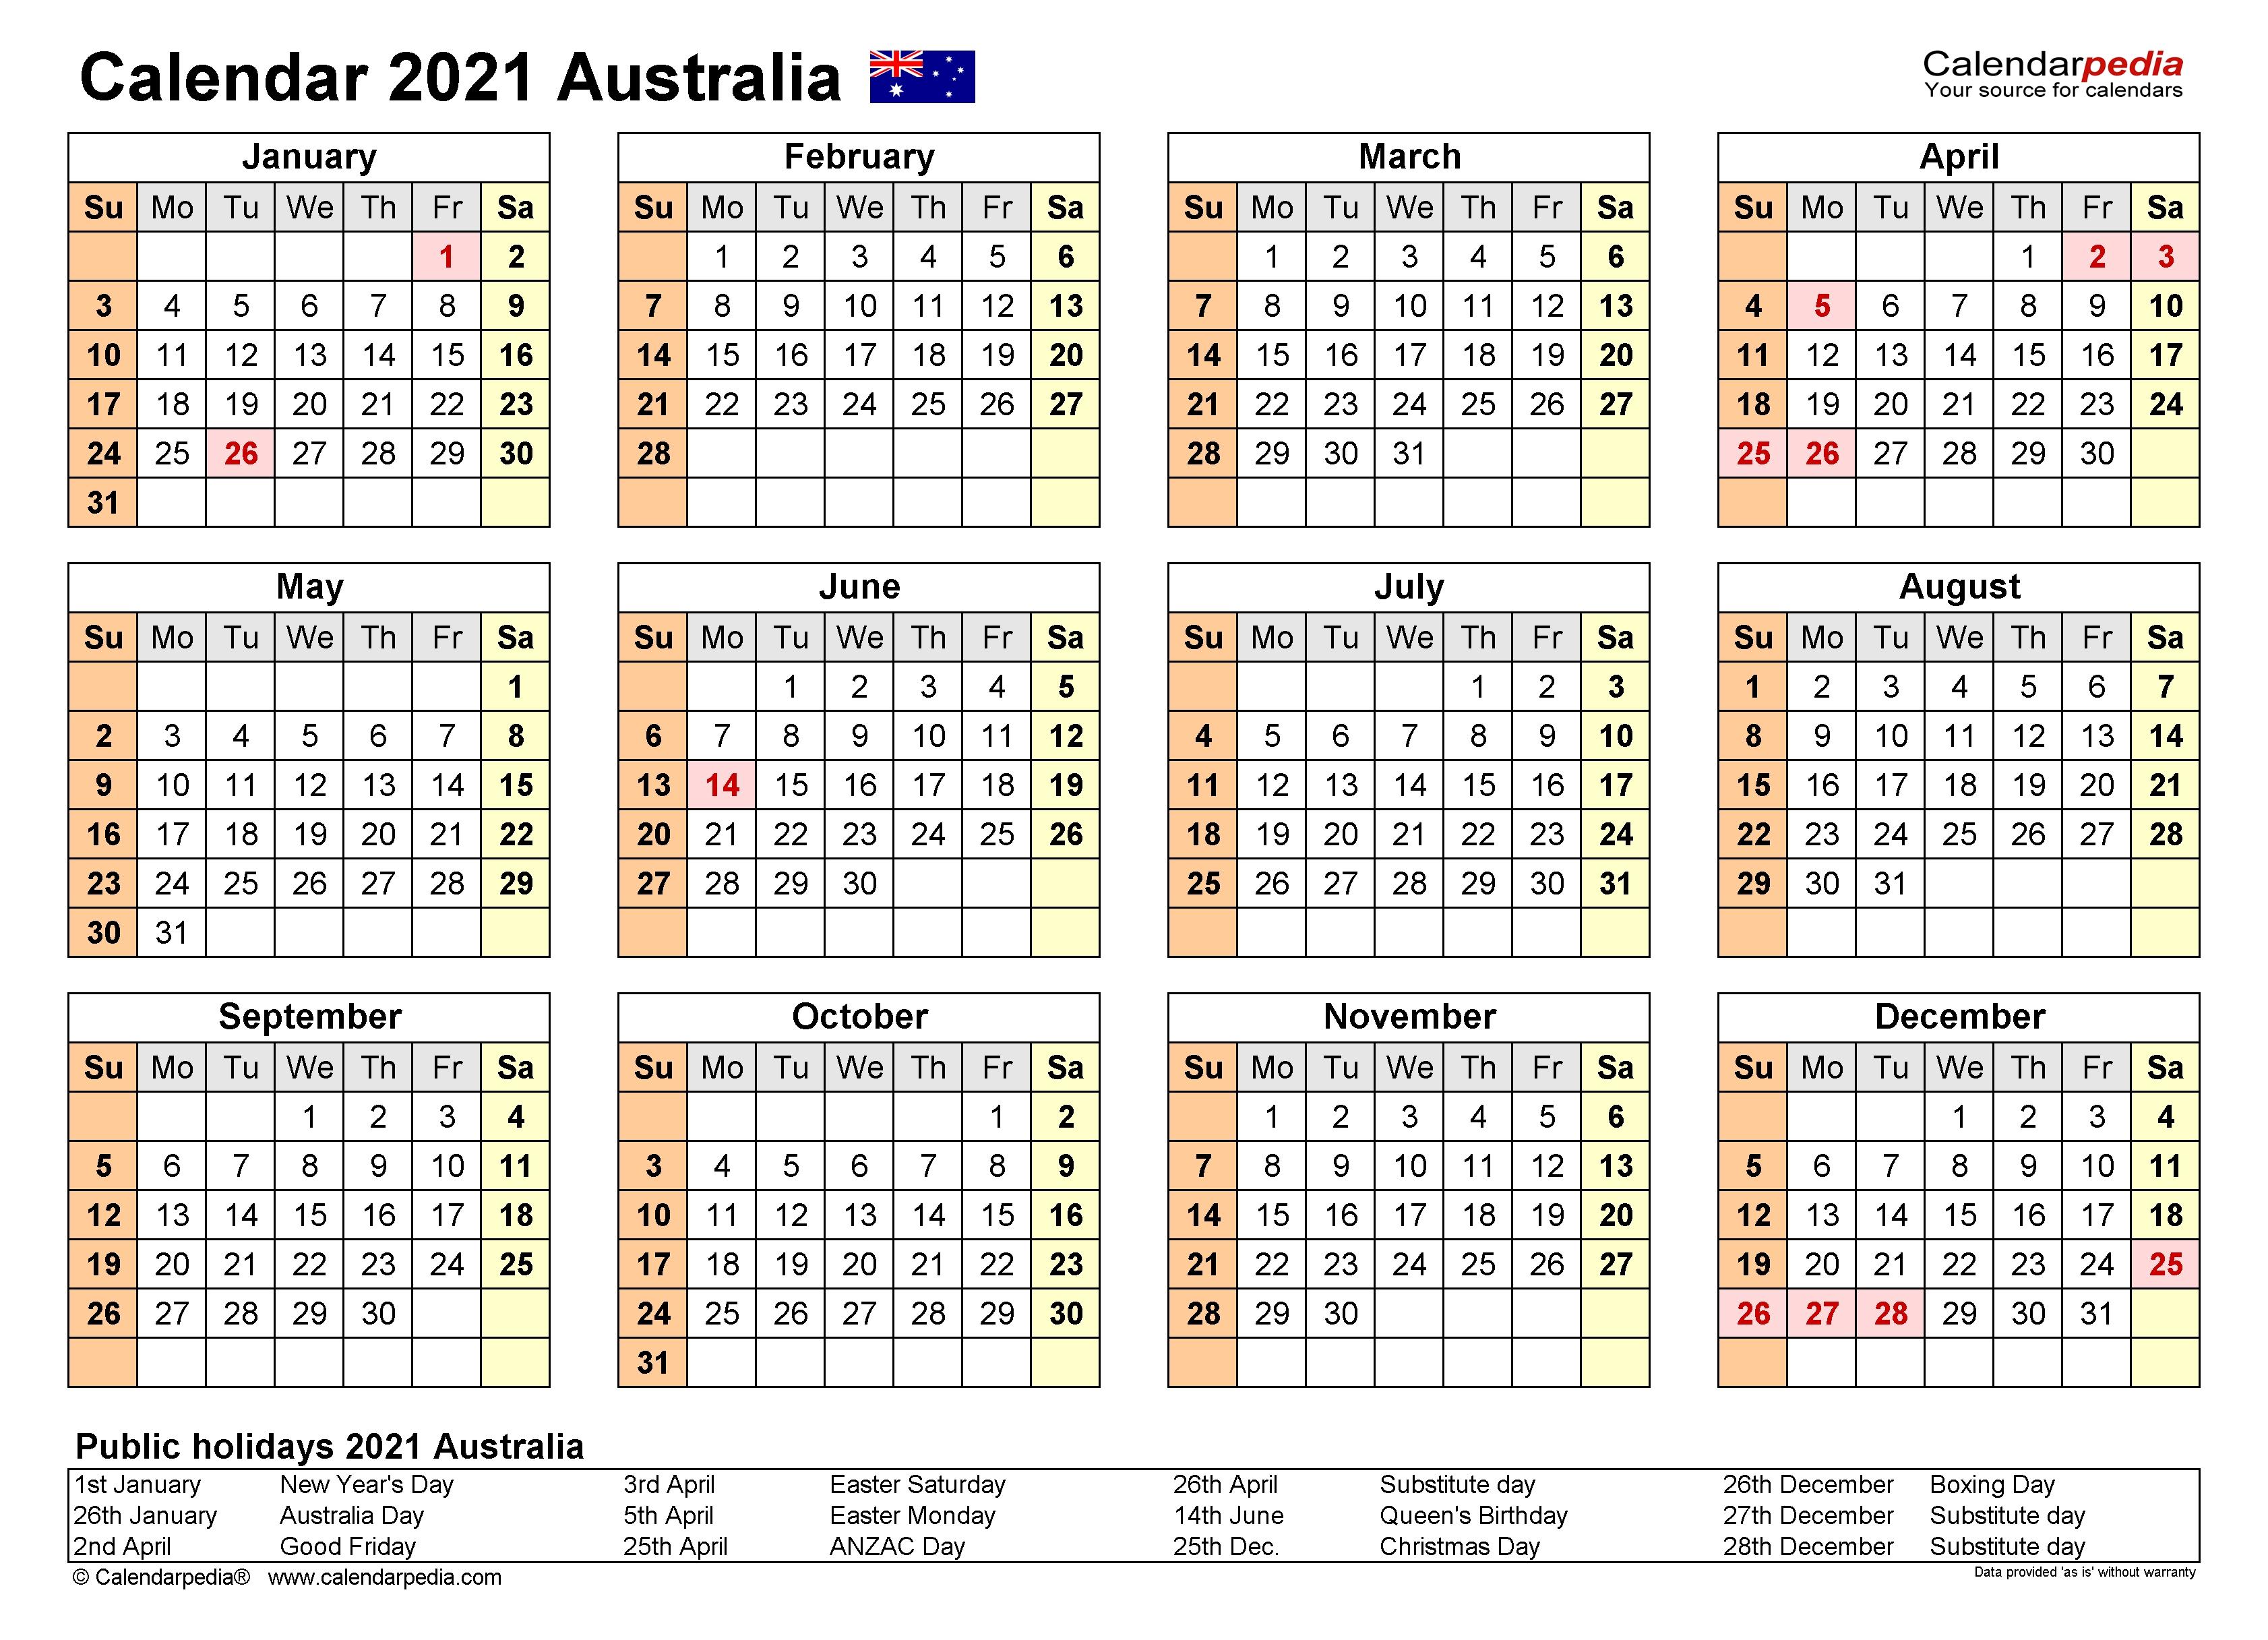 Australia Calendar 2021 - Free Printable Excel Templates  Australian Fiscal Year 2021